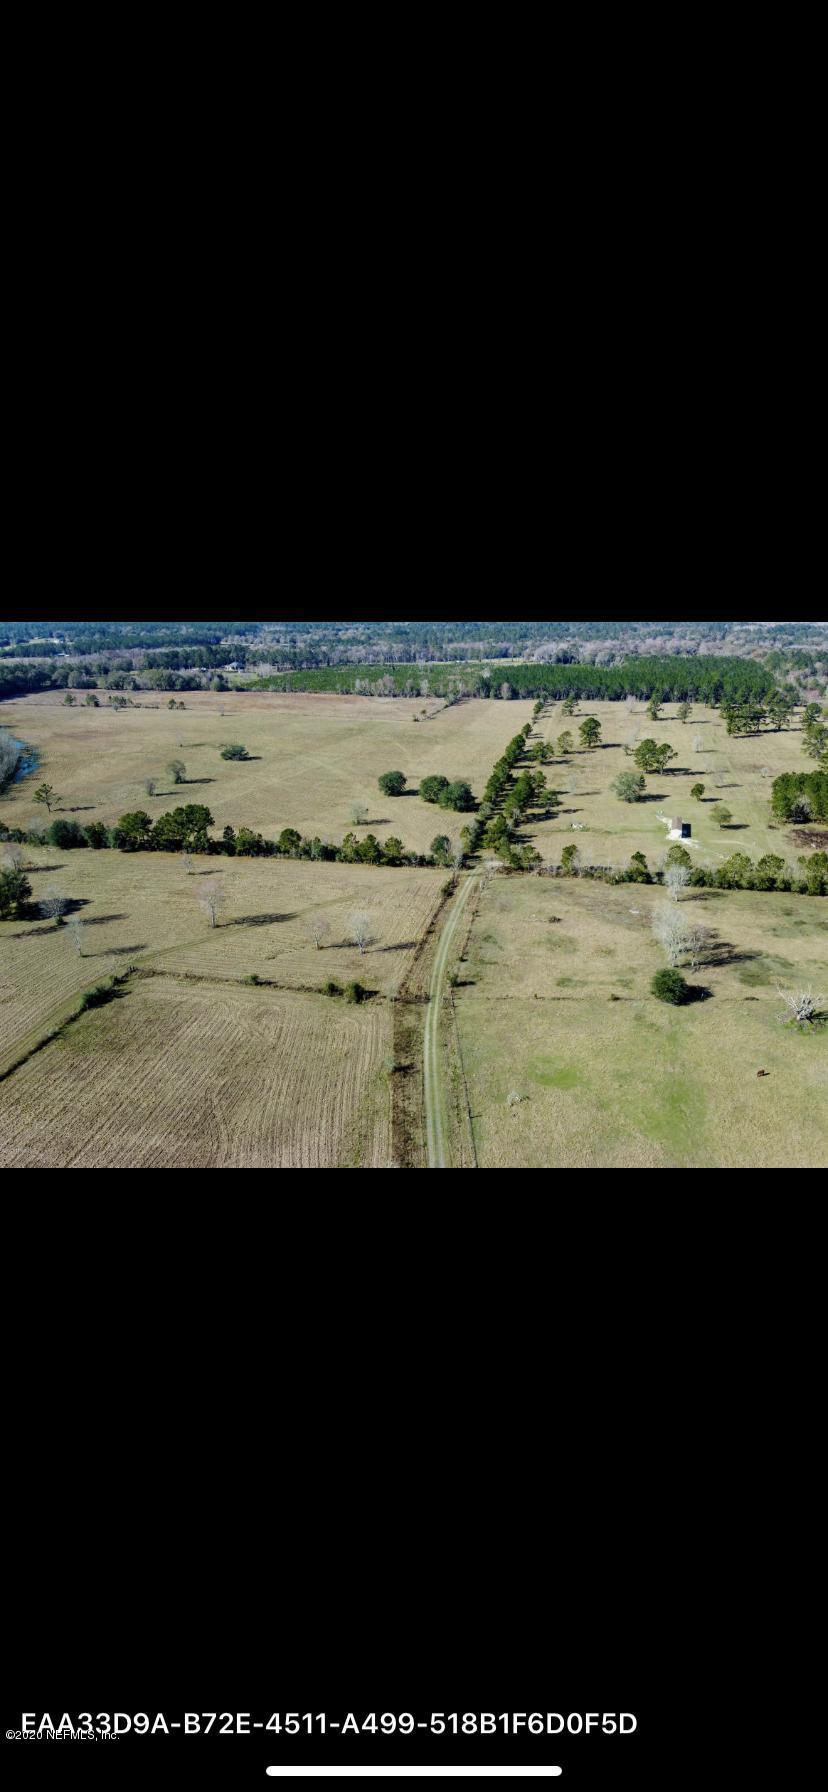 7794 FARM, MACCLENNY, FLORIDA 32063, ,Vacant land,For sale,FARM,1039706